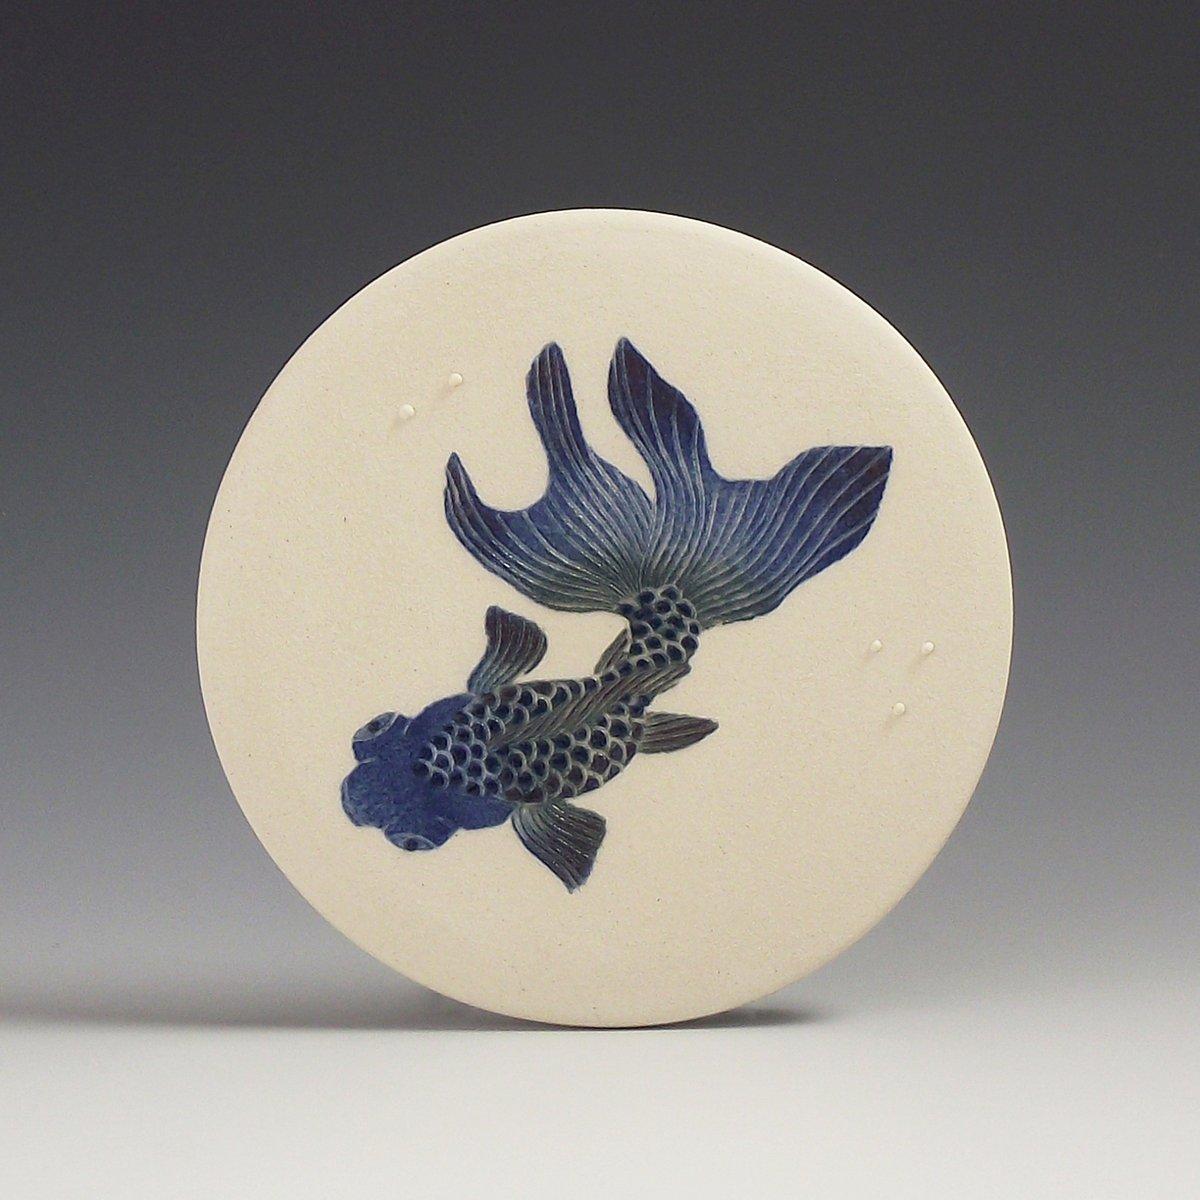 Moor fish ceramic wall hanging